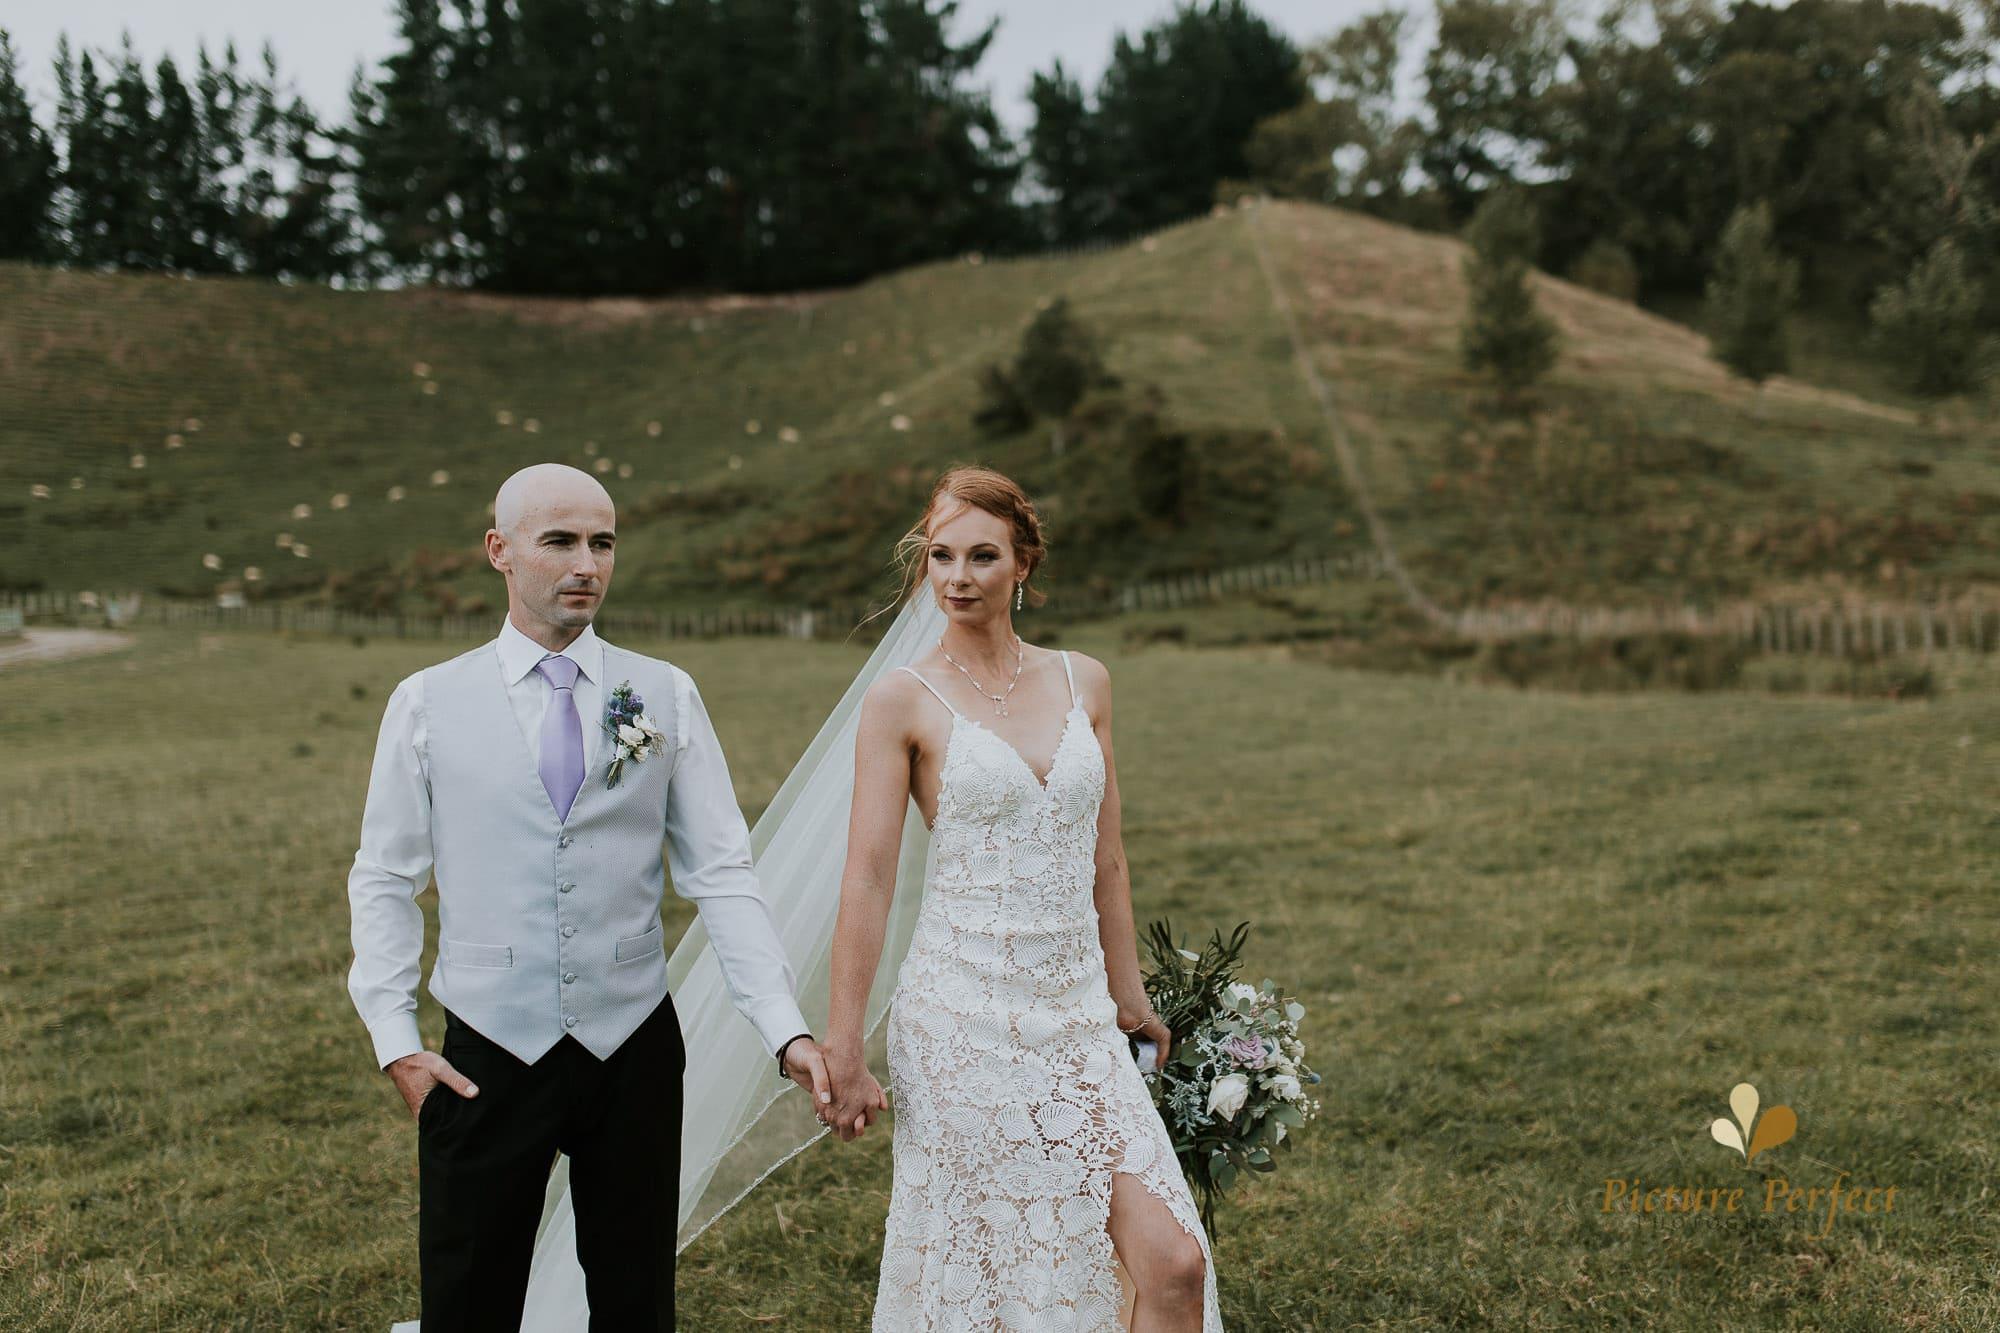 Freya and Matt fun wedding photography 0274